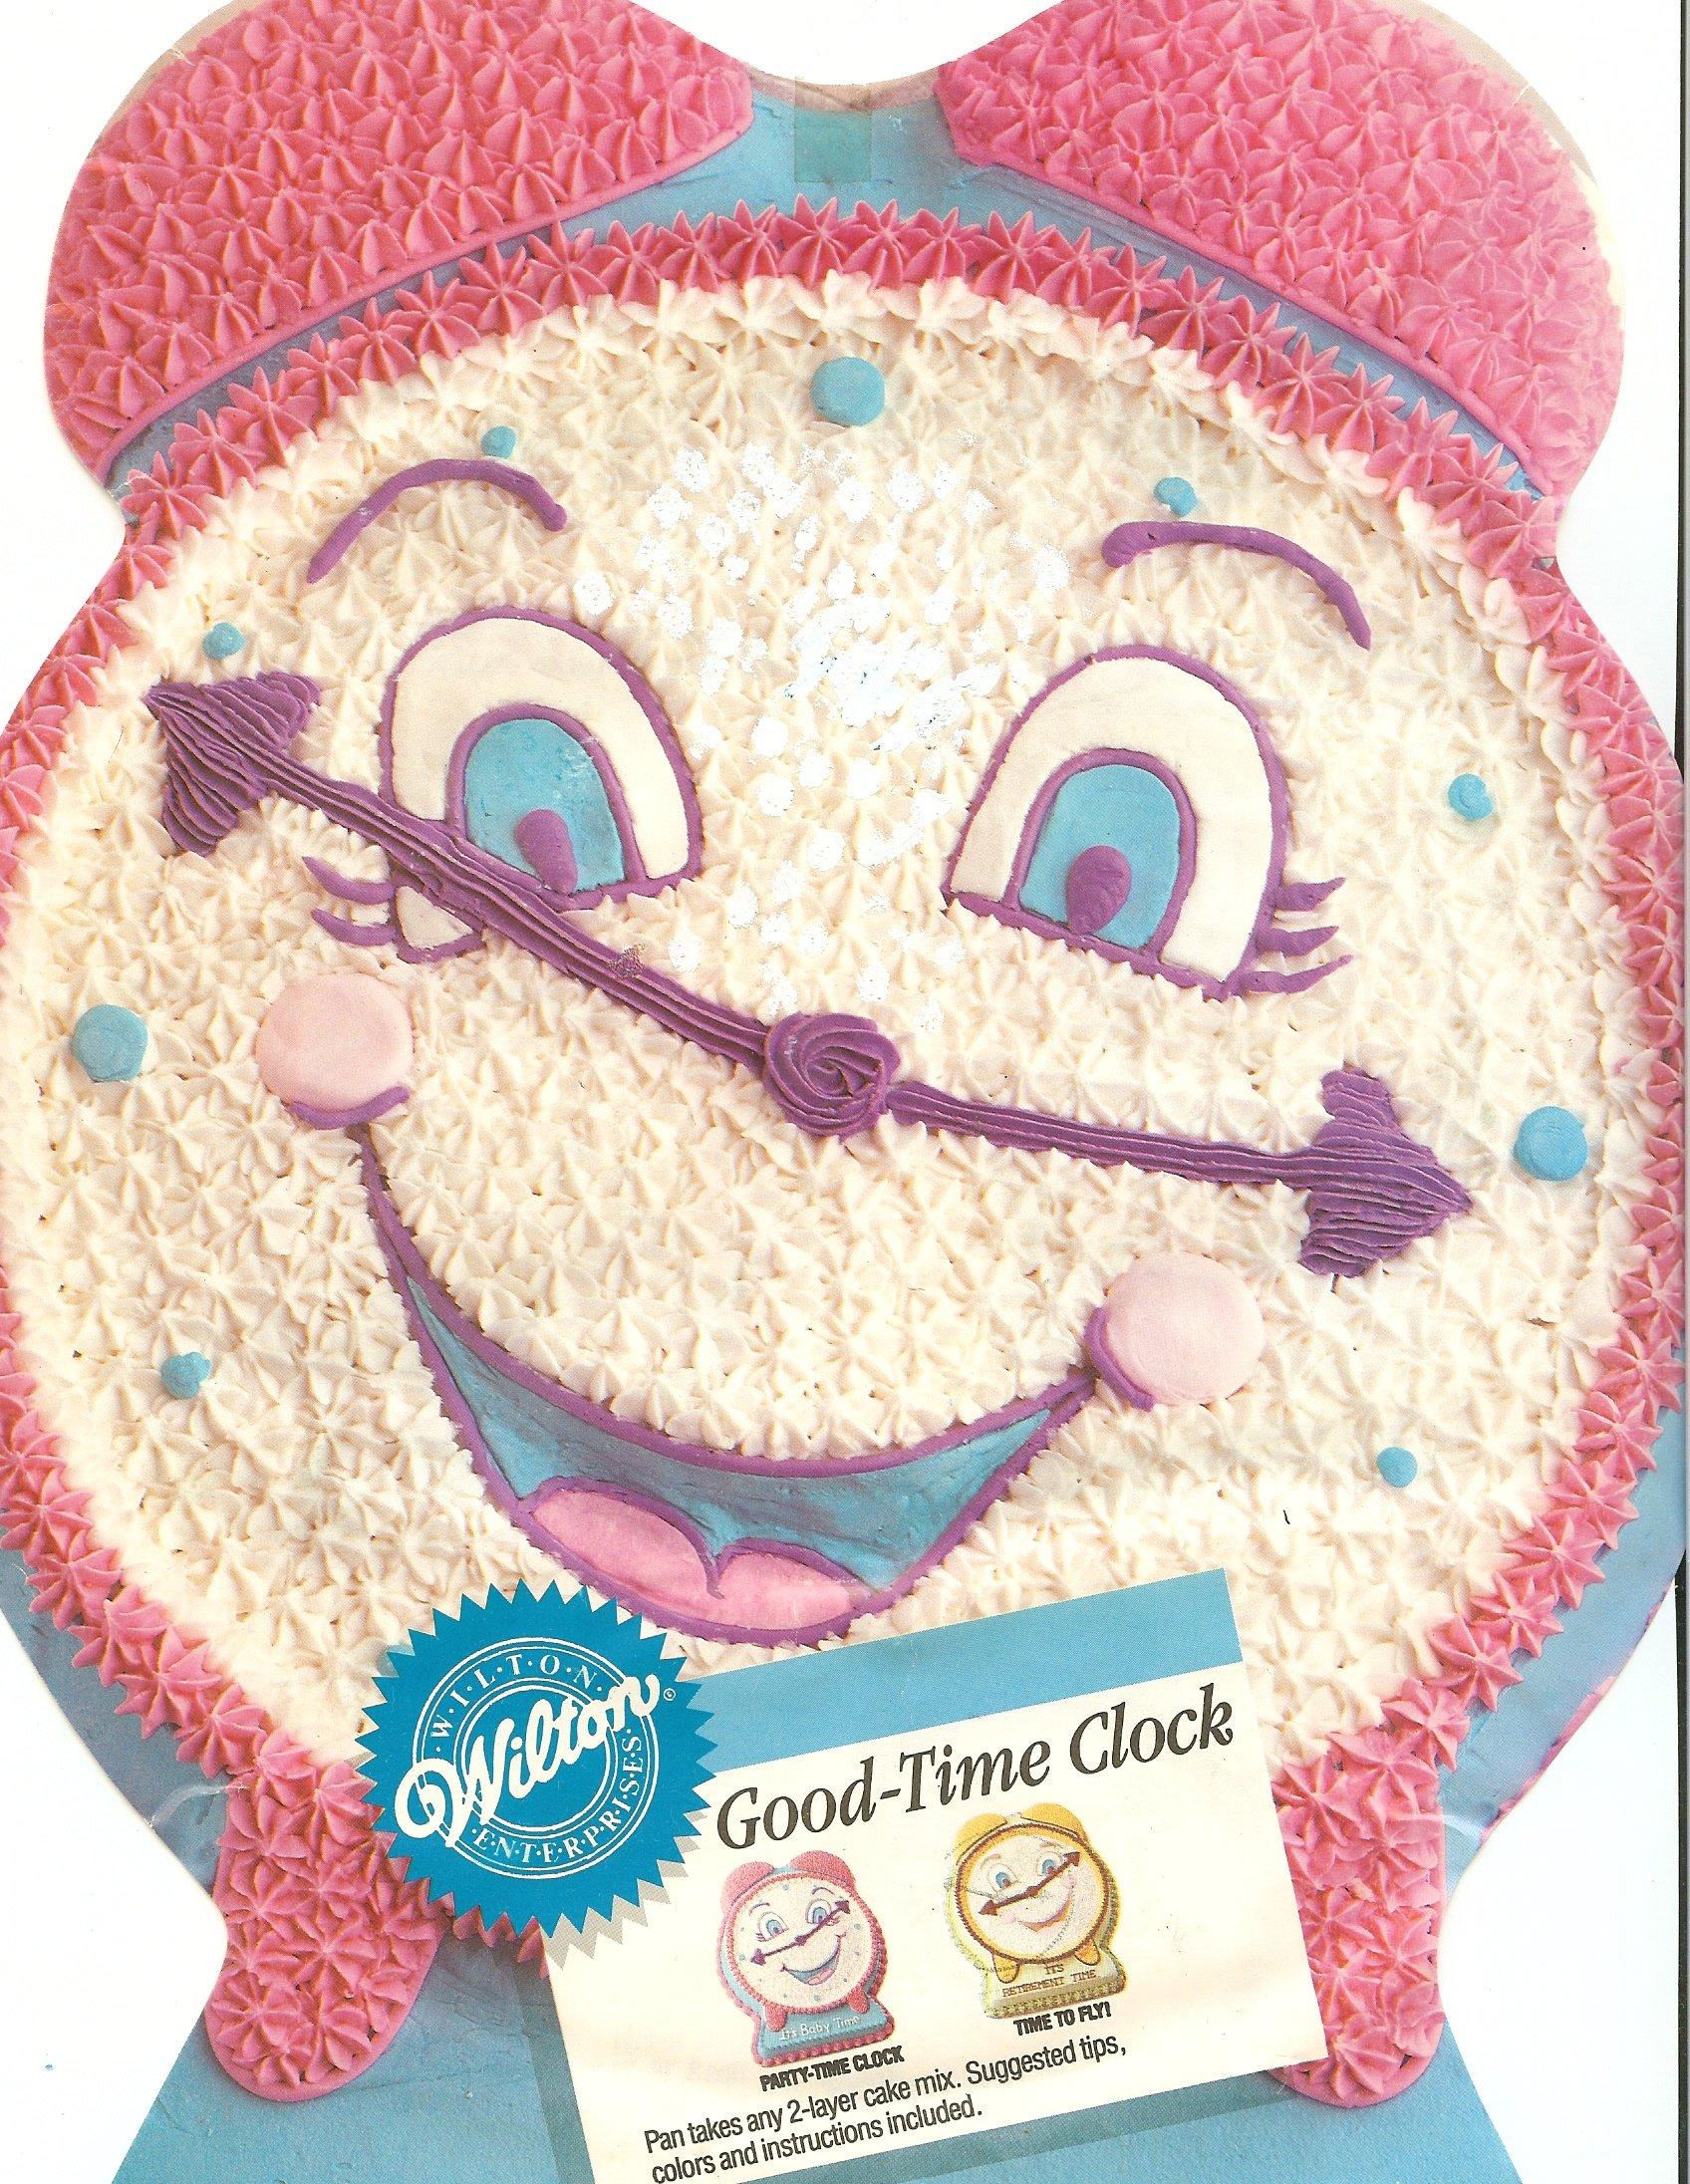 Wilton Good Time Clock Disney Beauty and Beast Cake Pan (2105-9111, 1991)